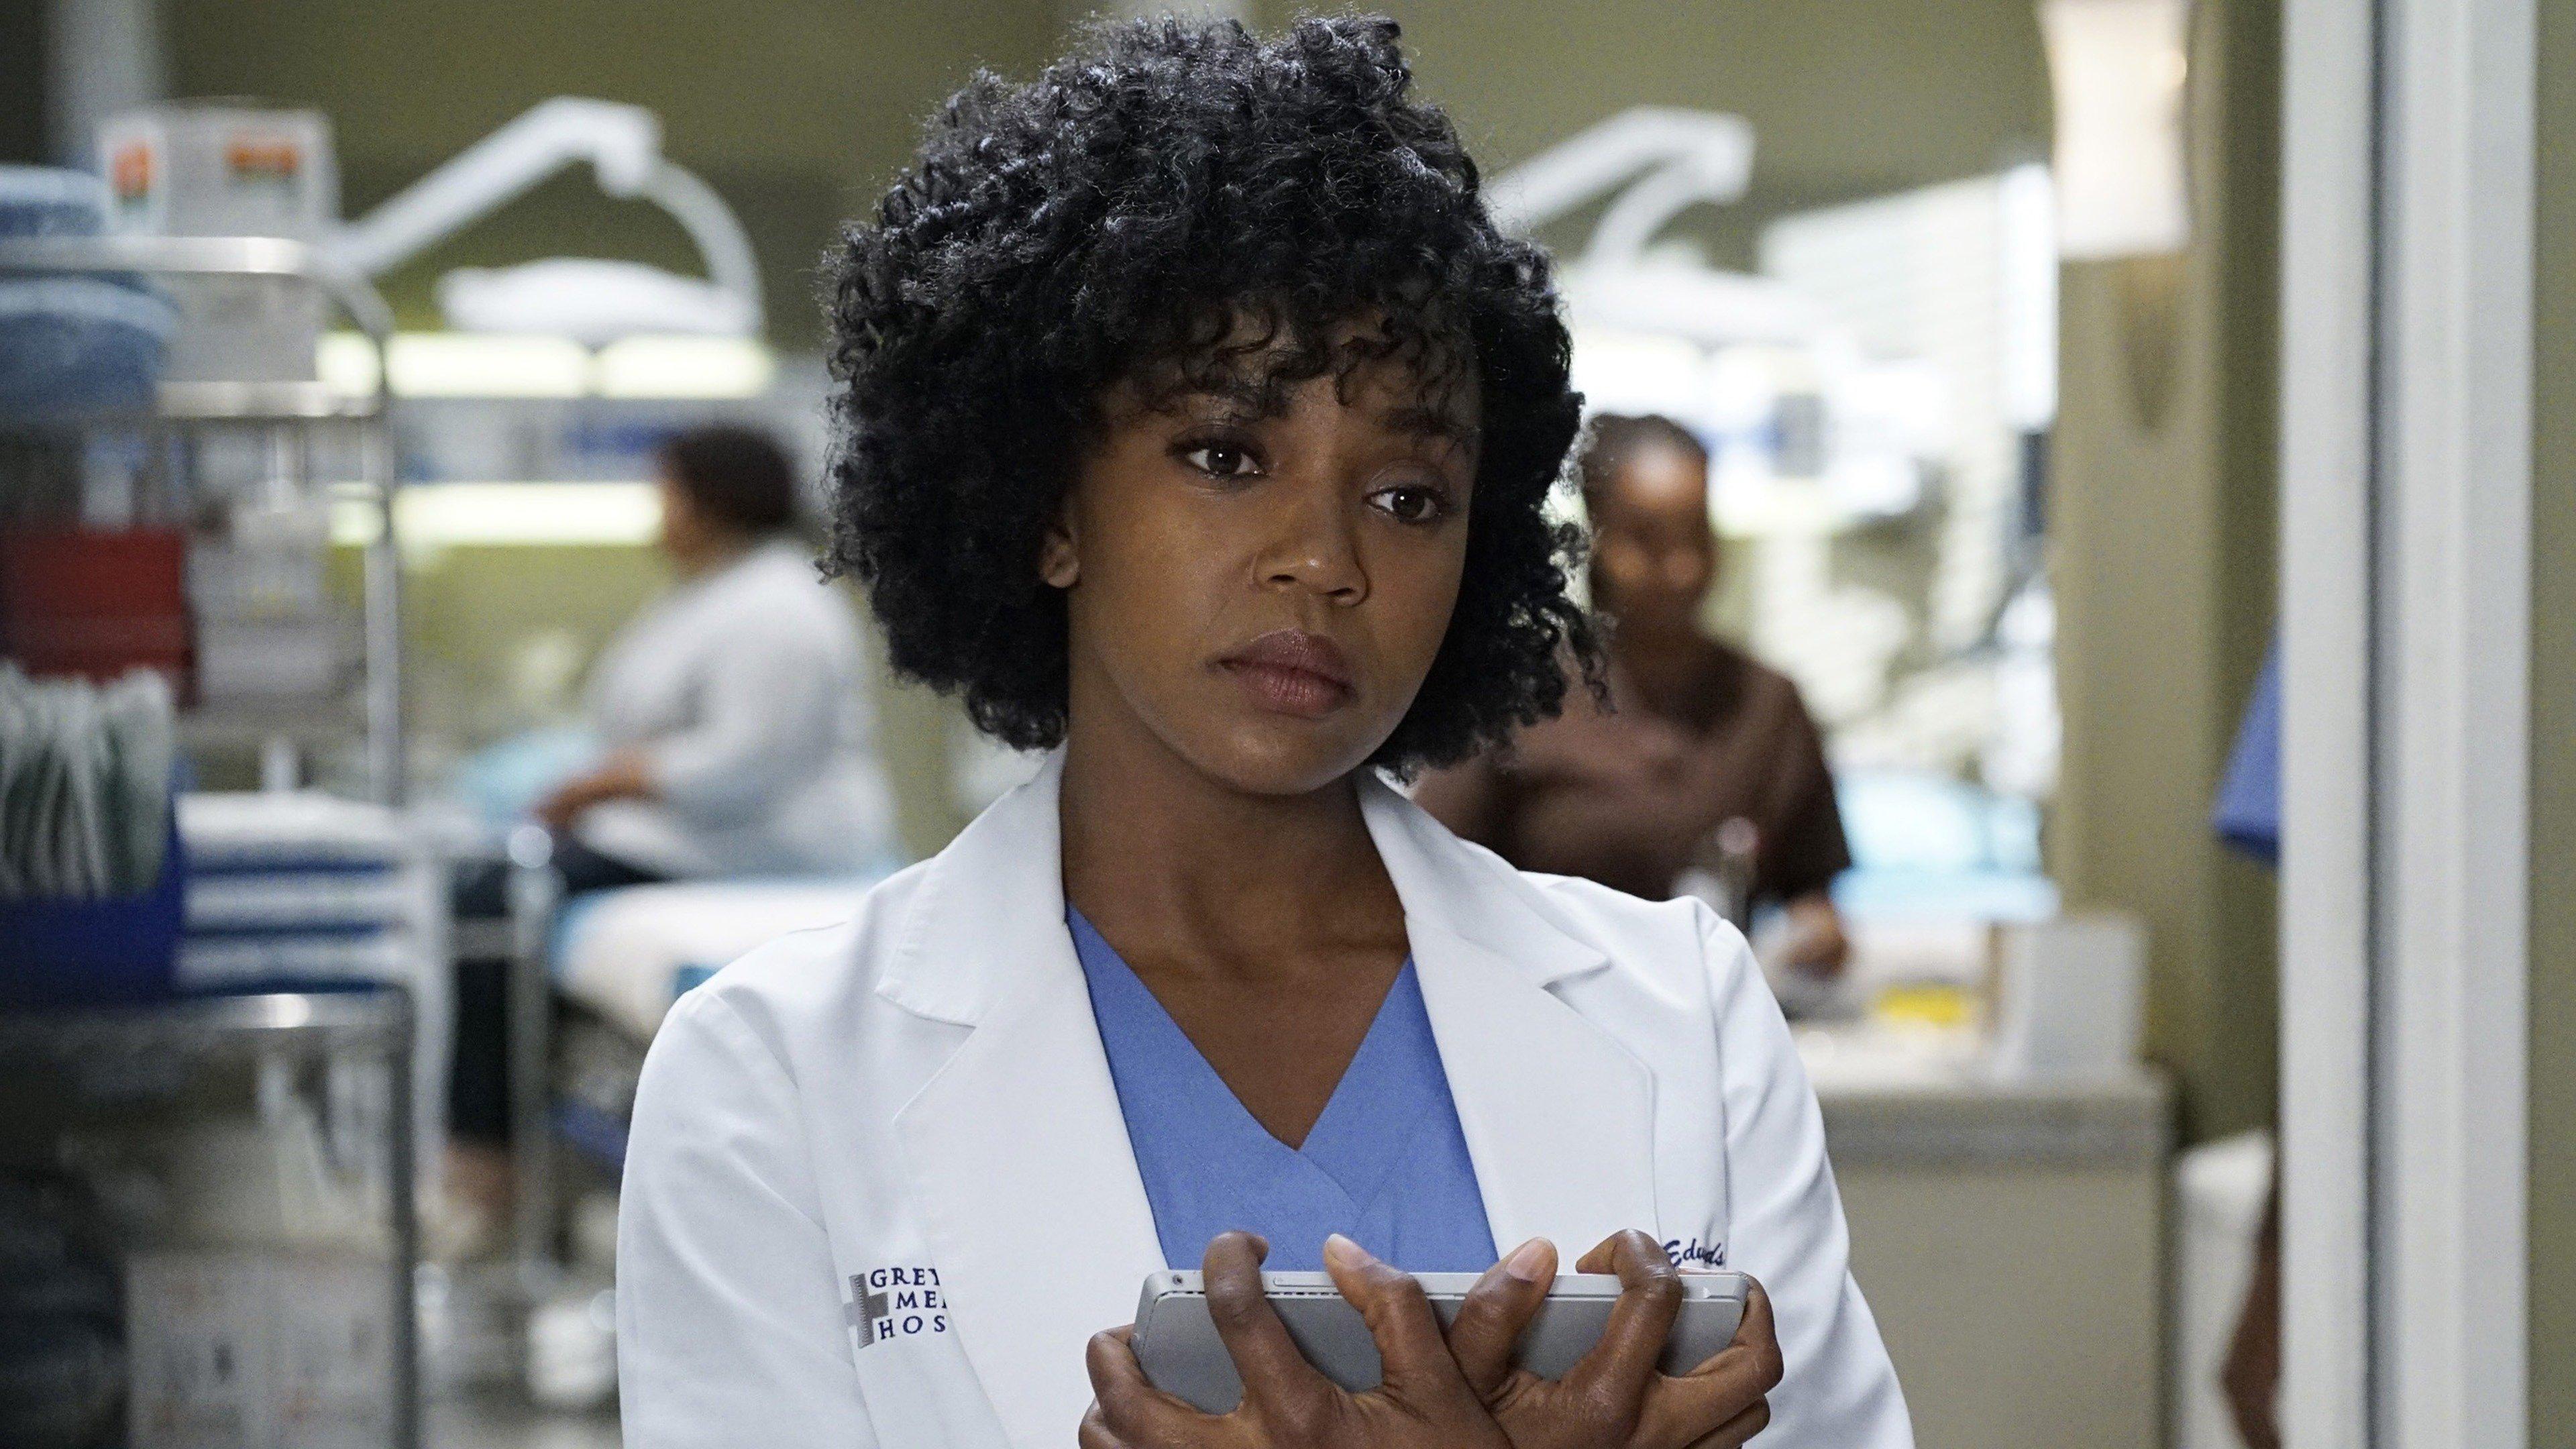 Greys Anatomy Season 12 Episode 22 Skycom